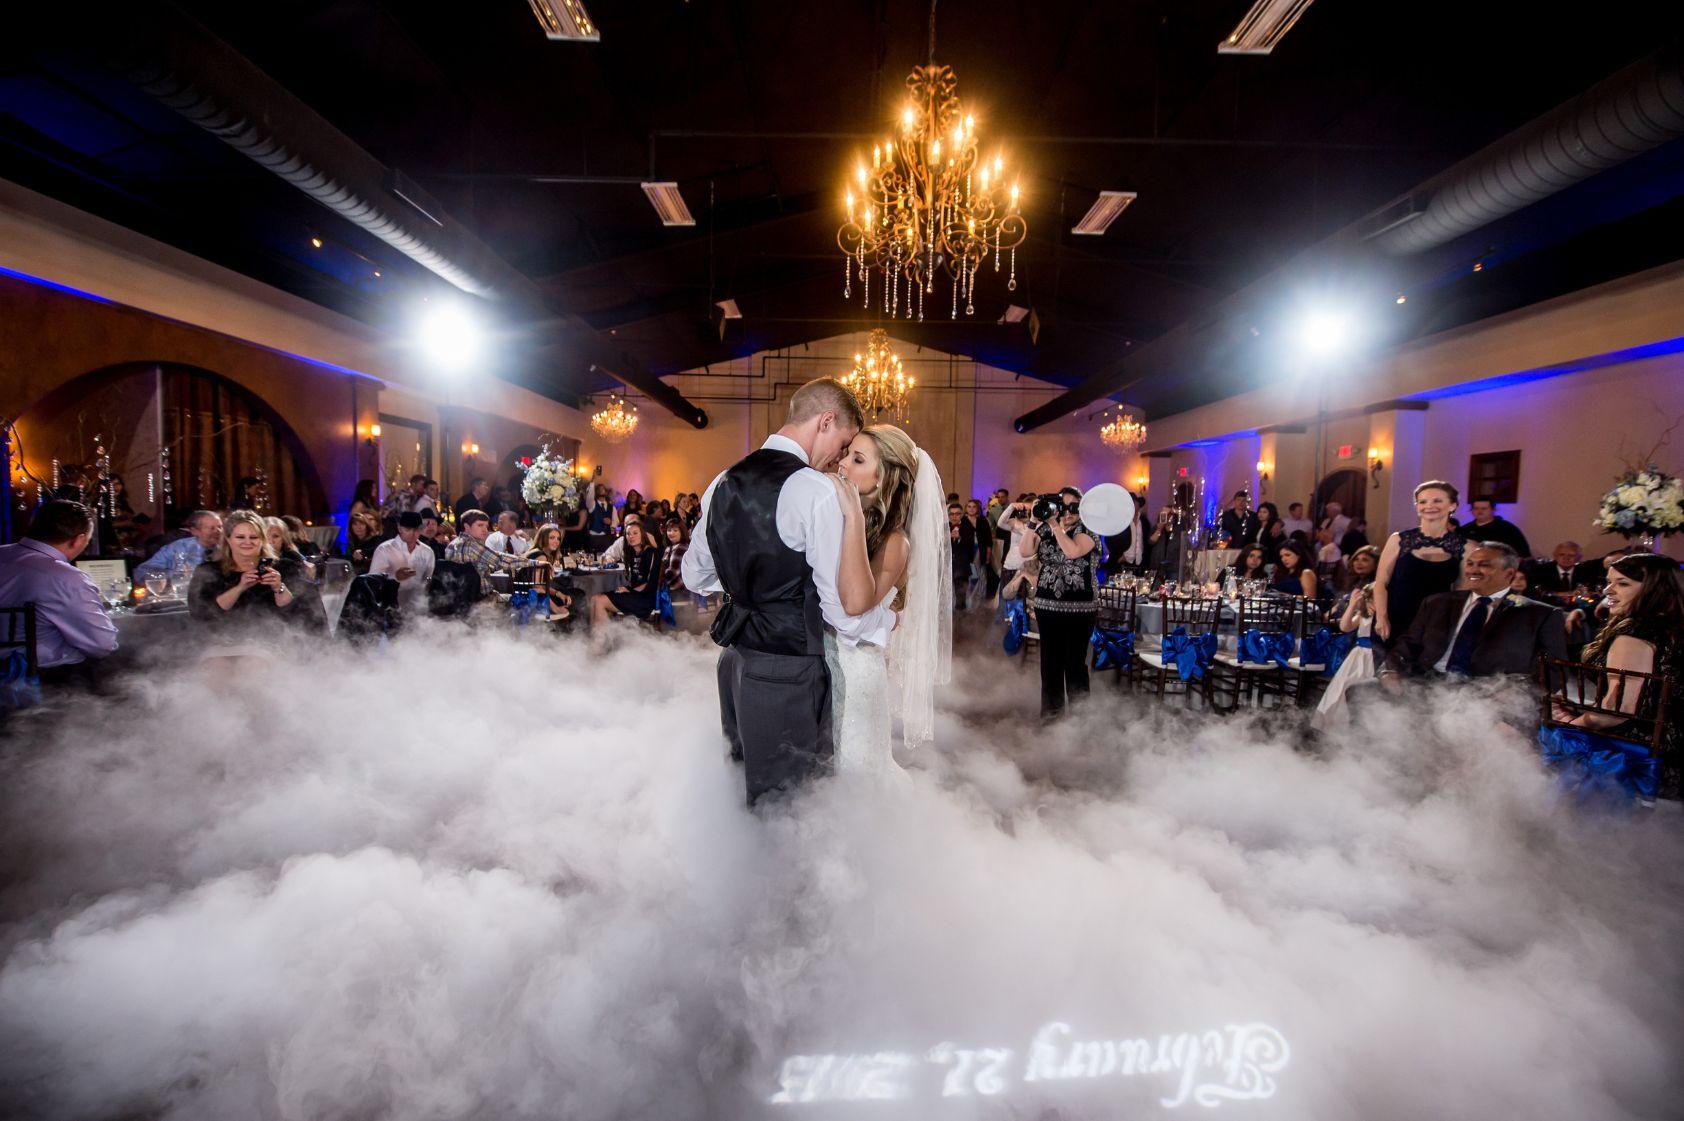 houston wedding DJ, sugar land wedding DJ, houston texas DJ, corporate event DJ in houston